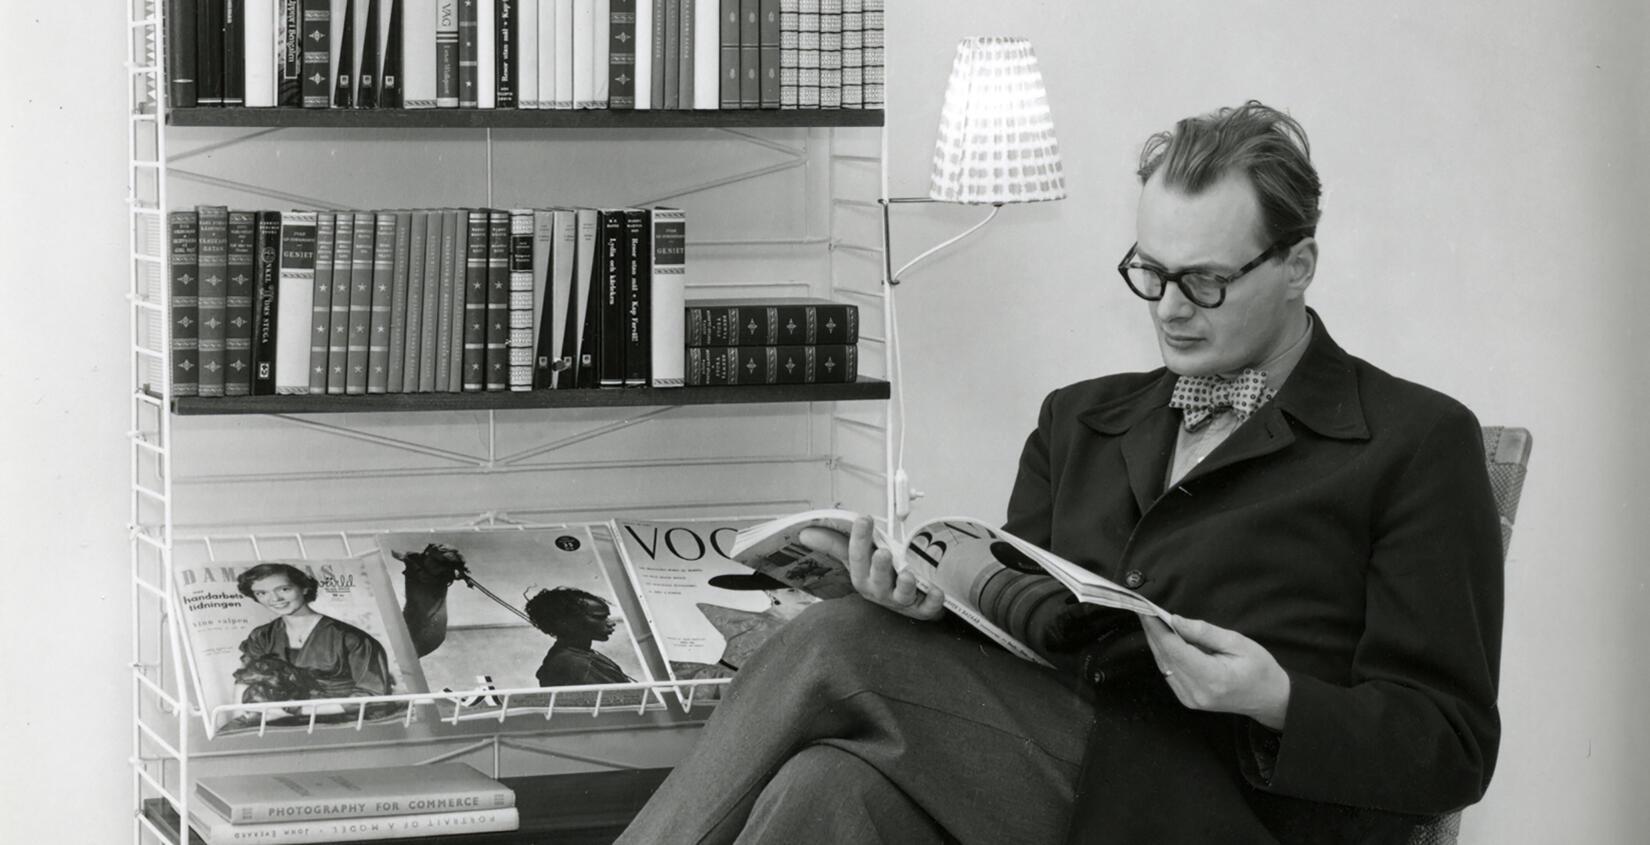 Nisse Strinning Olsson& Gerthel